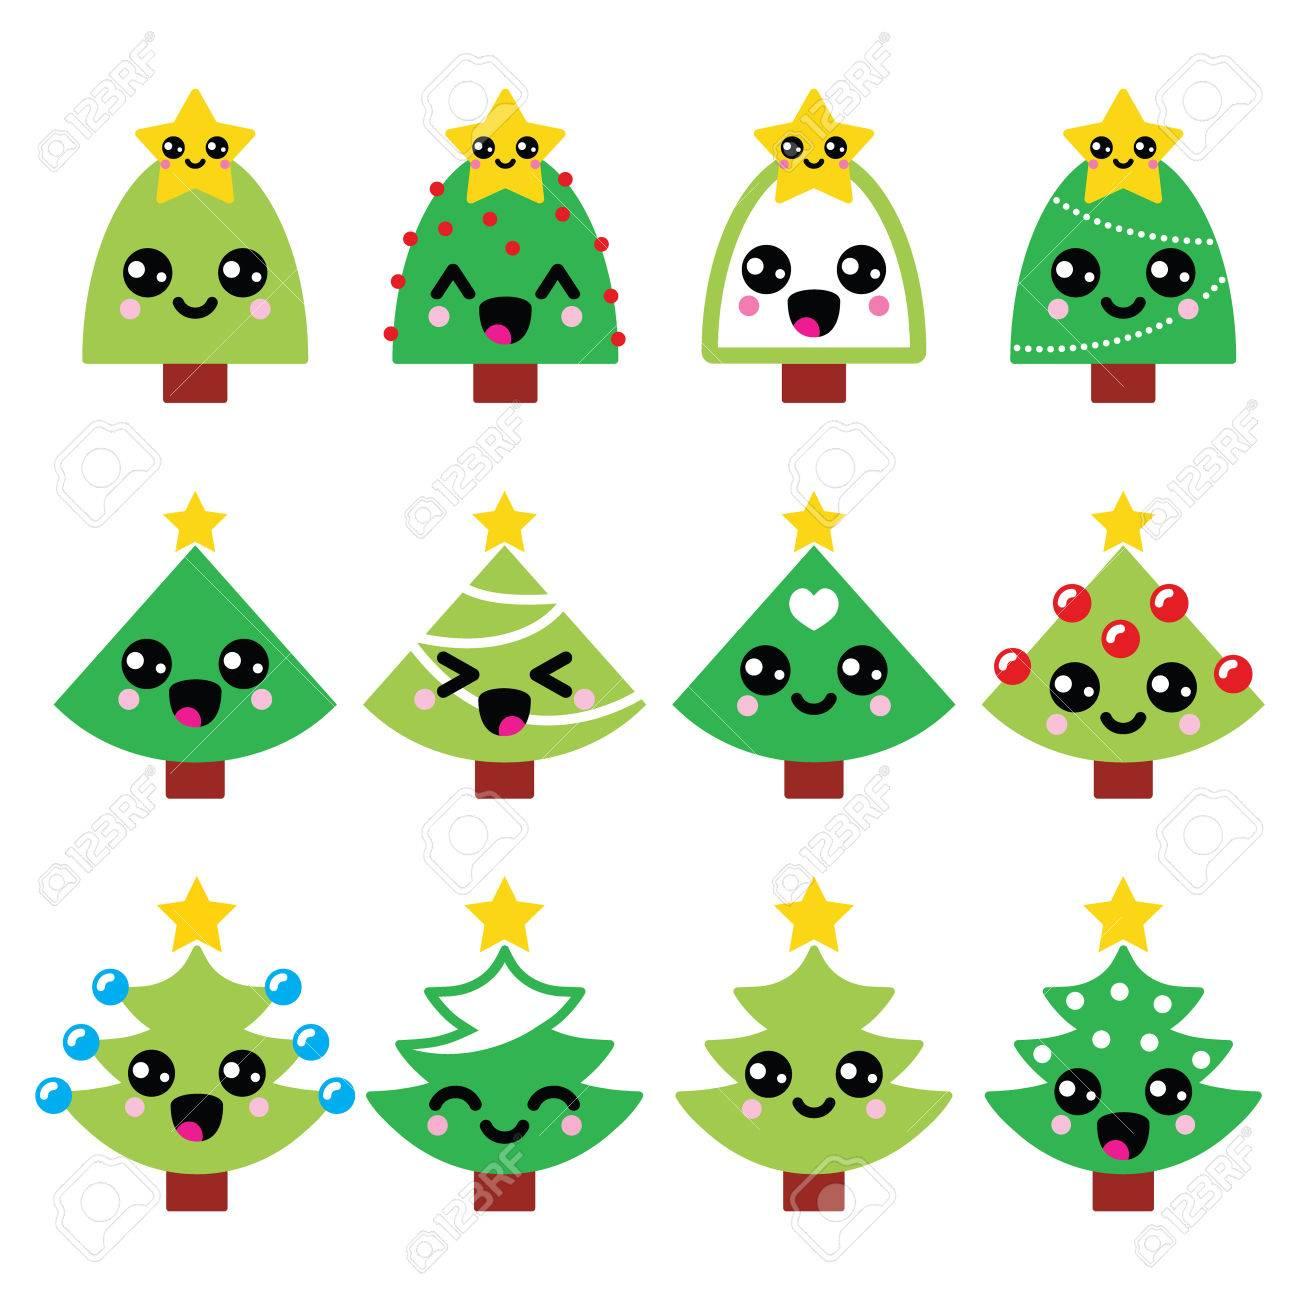 Cute Kawaii Christmas Green Tree With Star Vector Icons Set Royalty ...